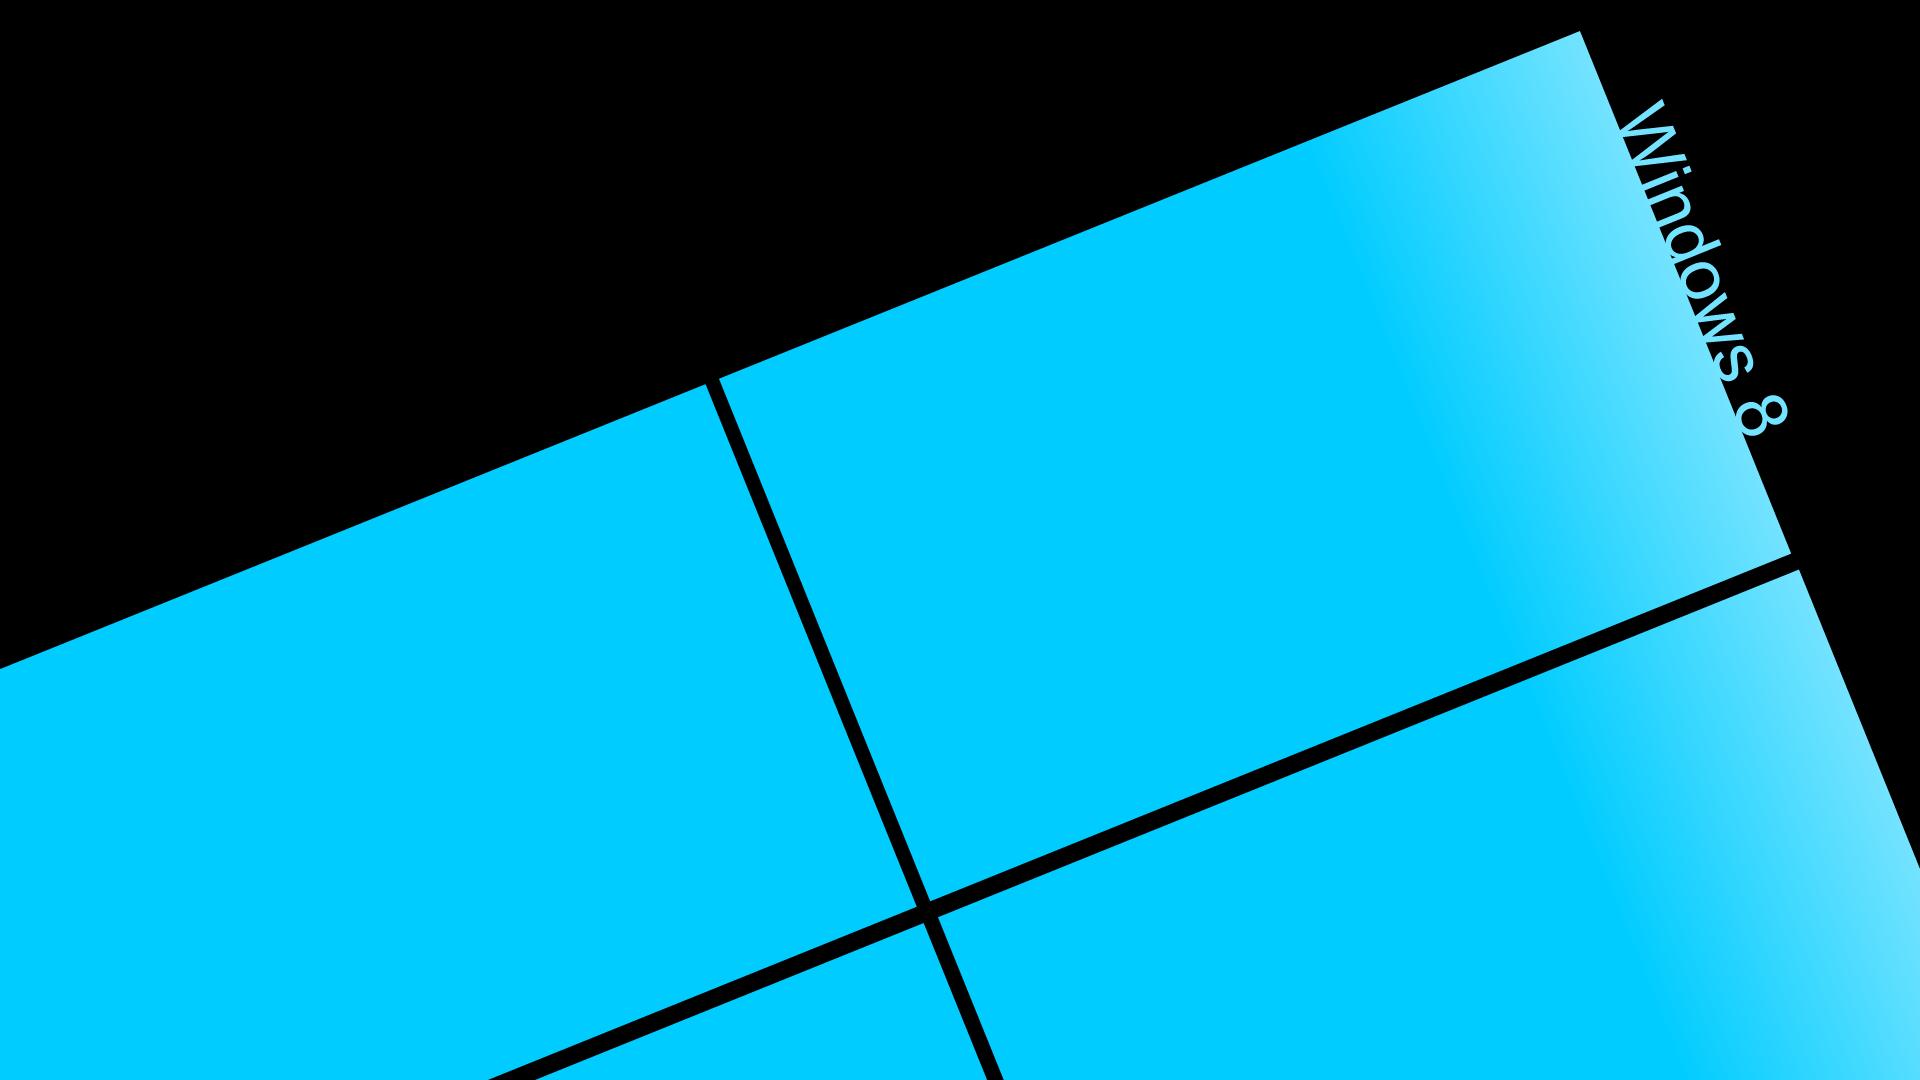 2k wallpaper windows 10 wallpapersafari - Windows 8 1 wallpaper hd nature ...